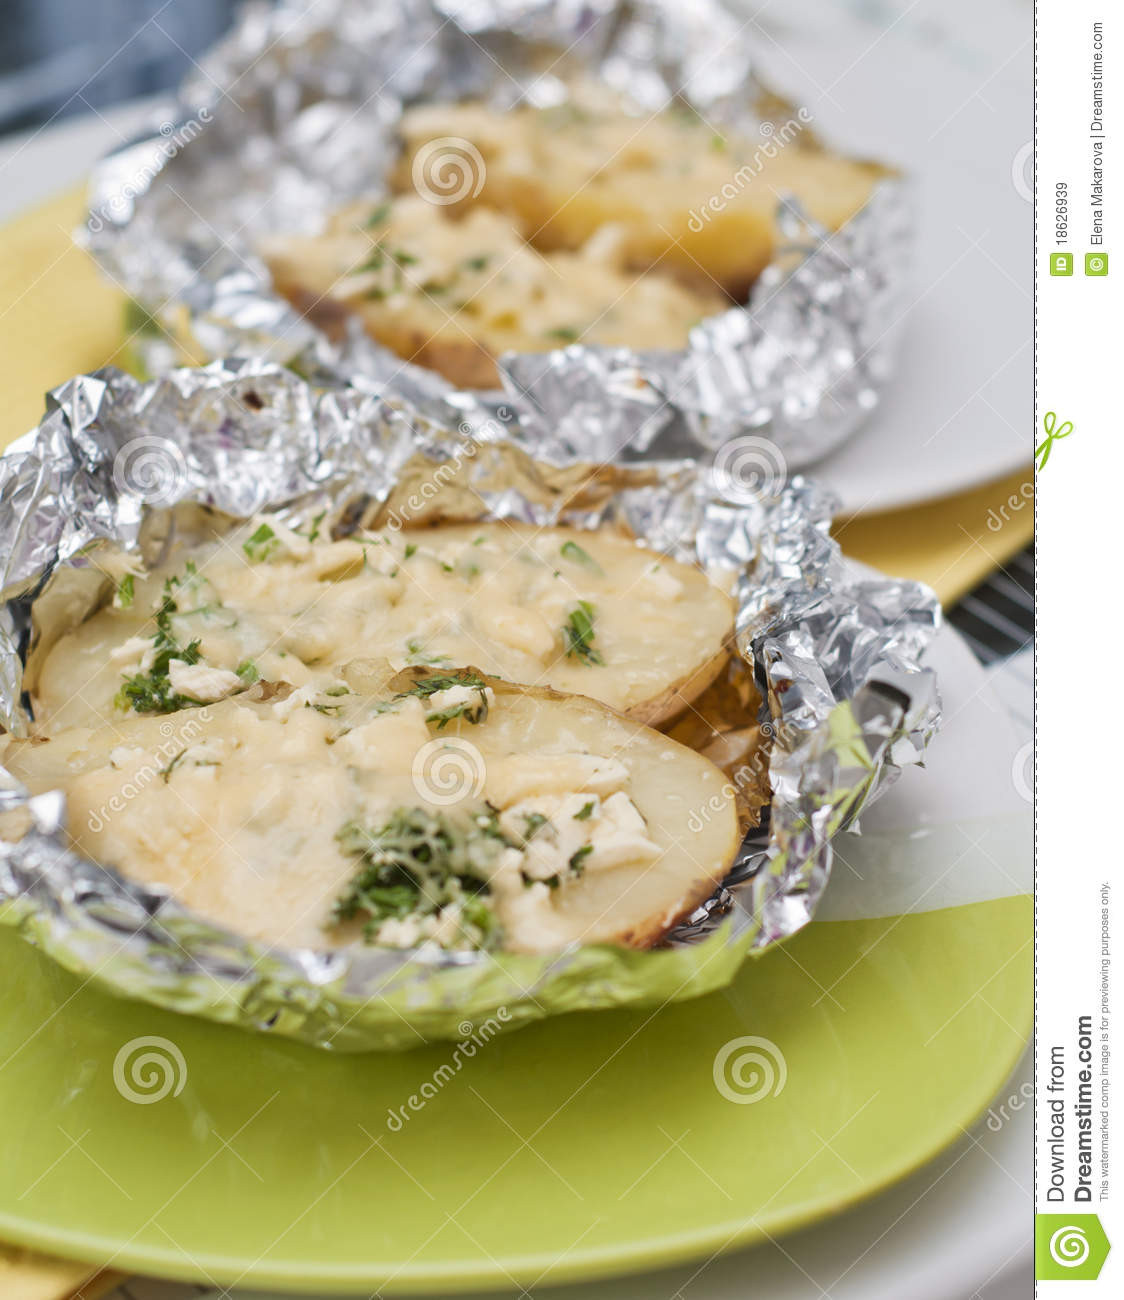 Baked Potato In Foil  Aluminum Foil Aluminum Foil Baked Potato